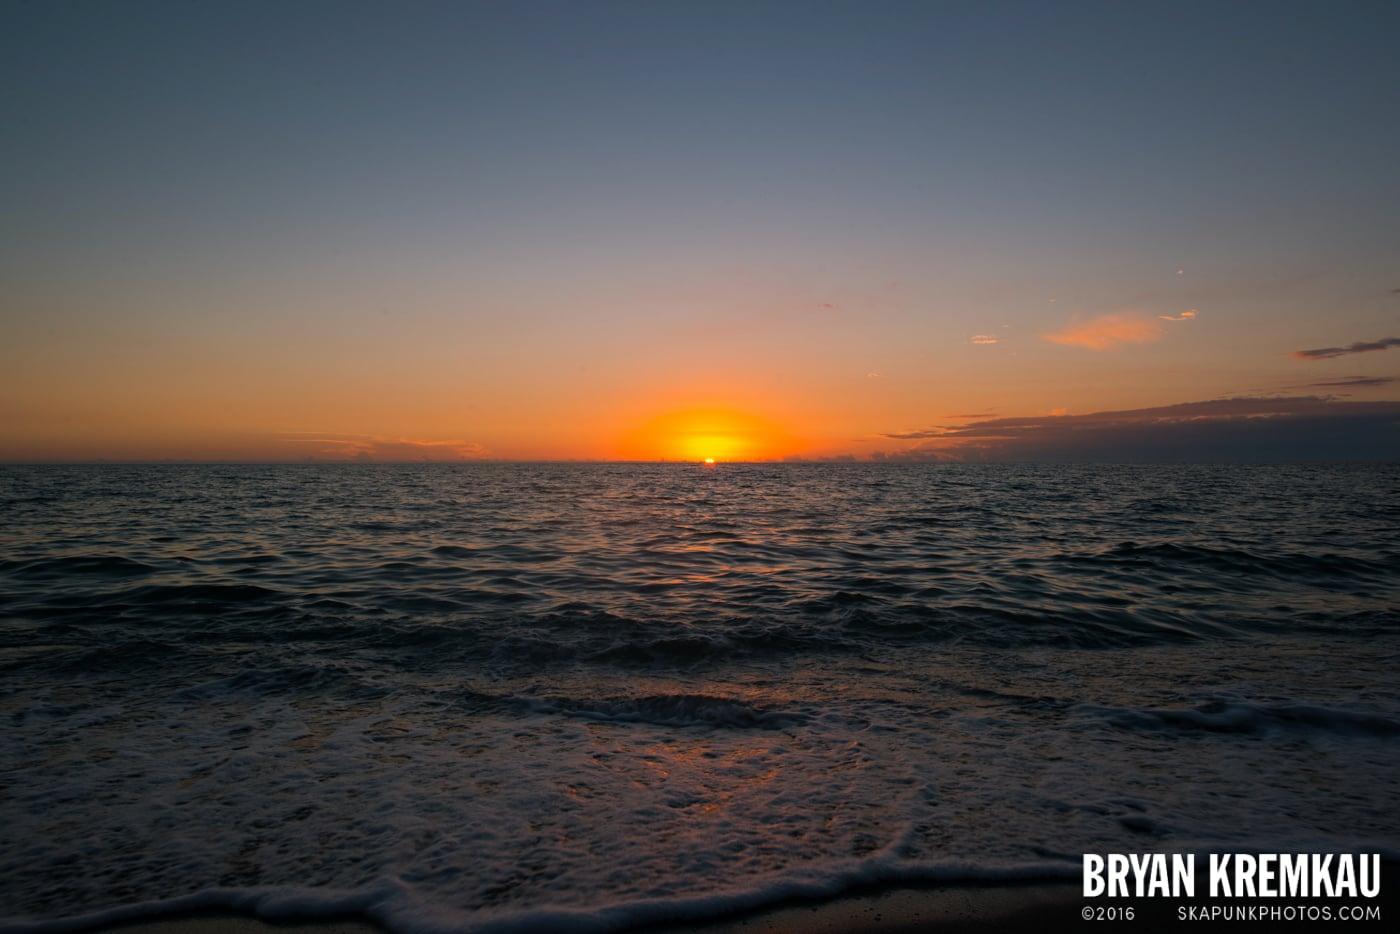 Sunsets, Astrophotography & Birds @ Venice, Florida - 10.25.14 - 11.5.14 (116)